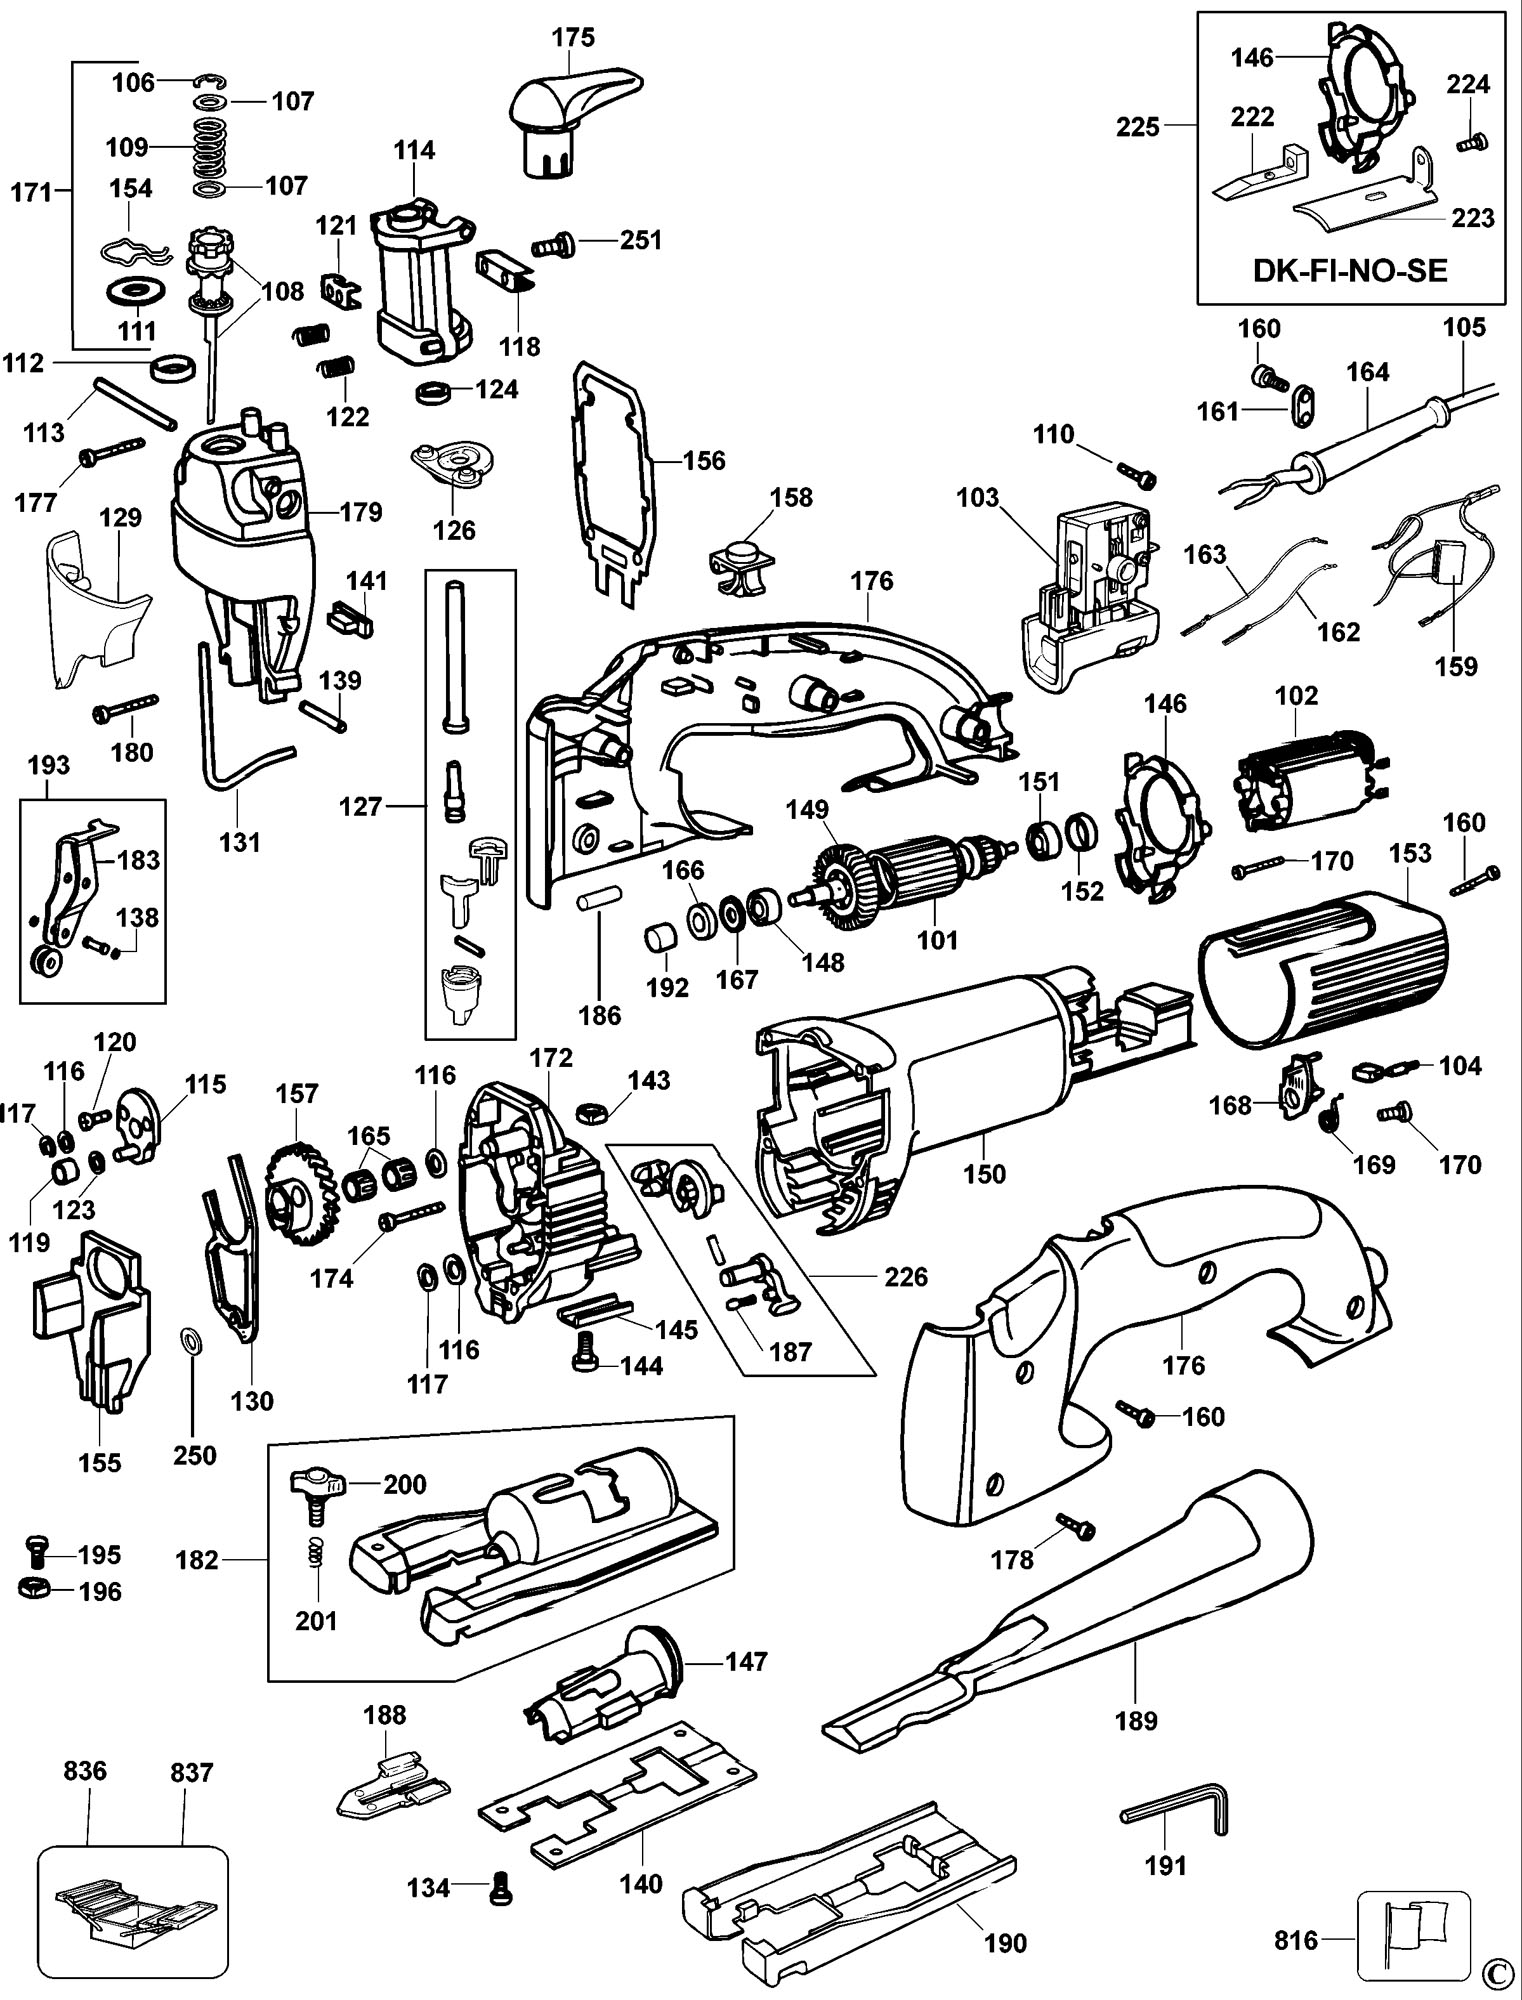 Spares For Dewalt Dw321 Jigsaw Type 1 Spare Dw321 Type 1